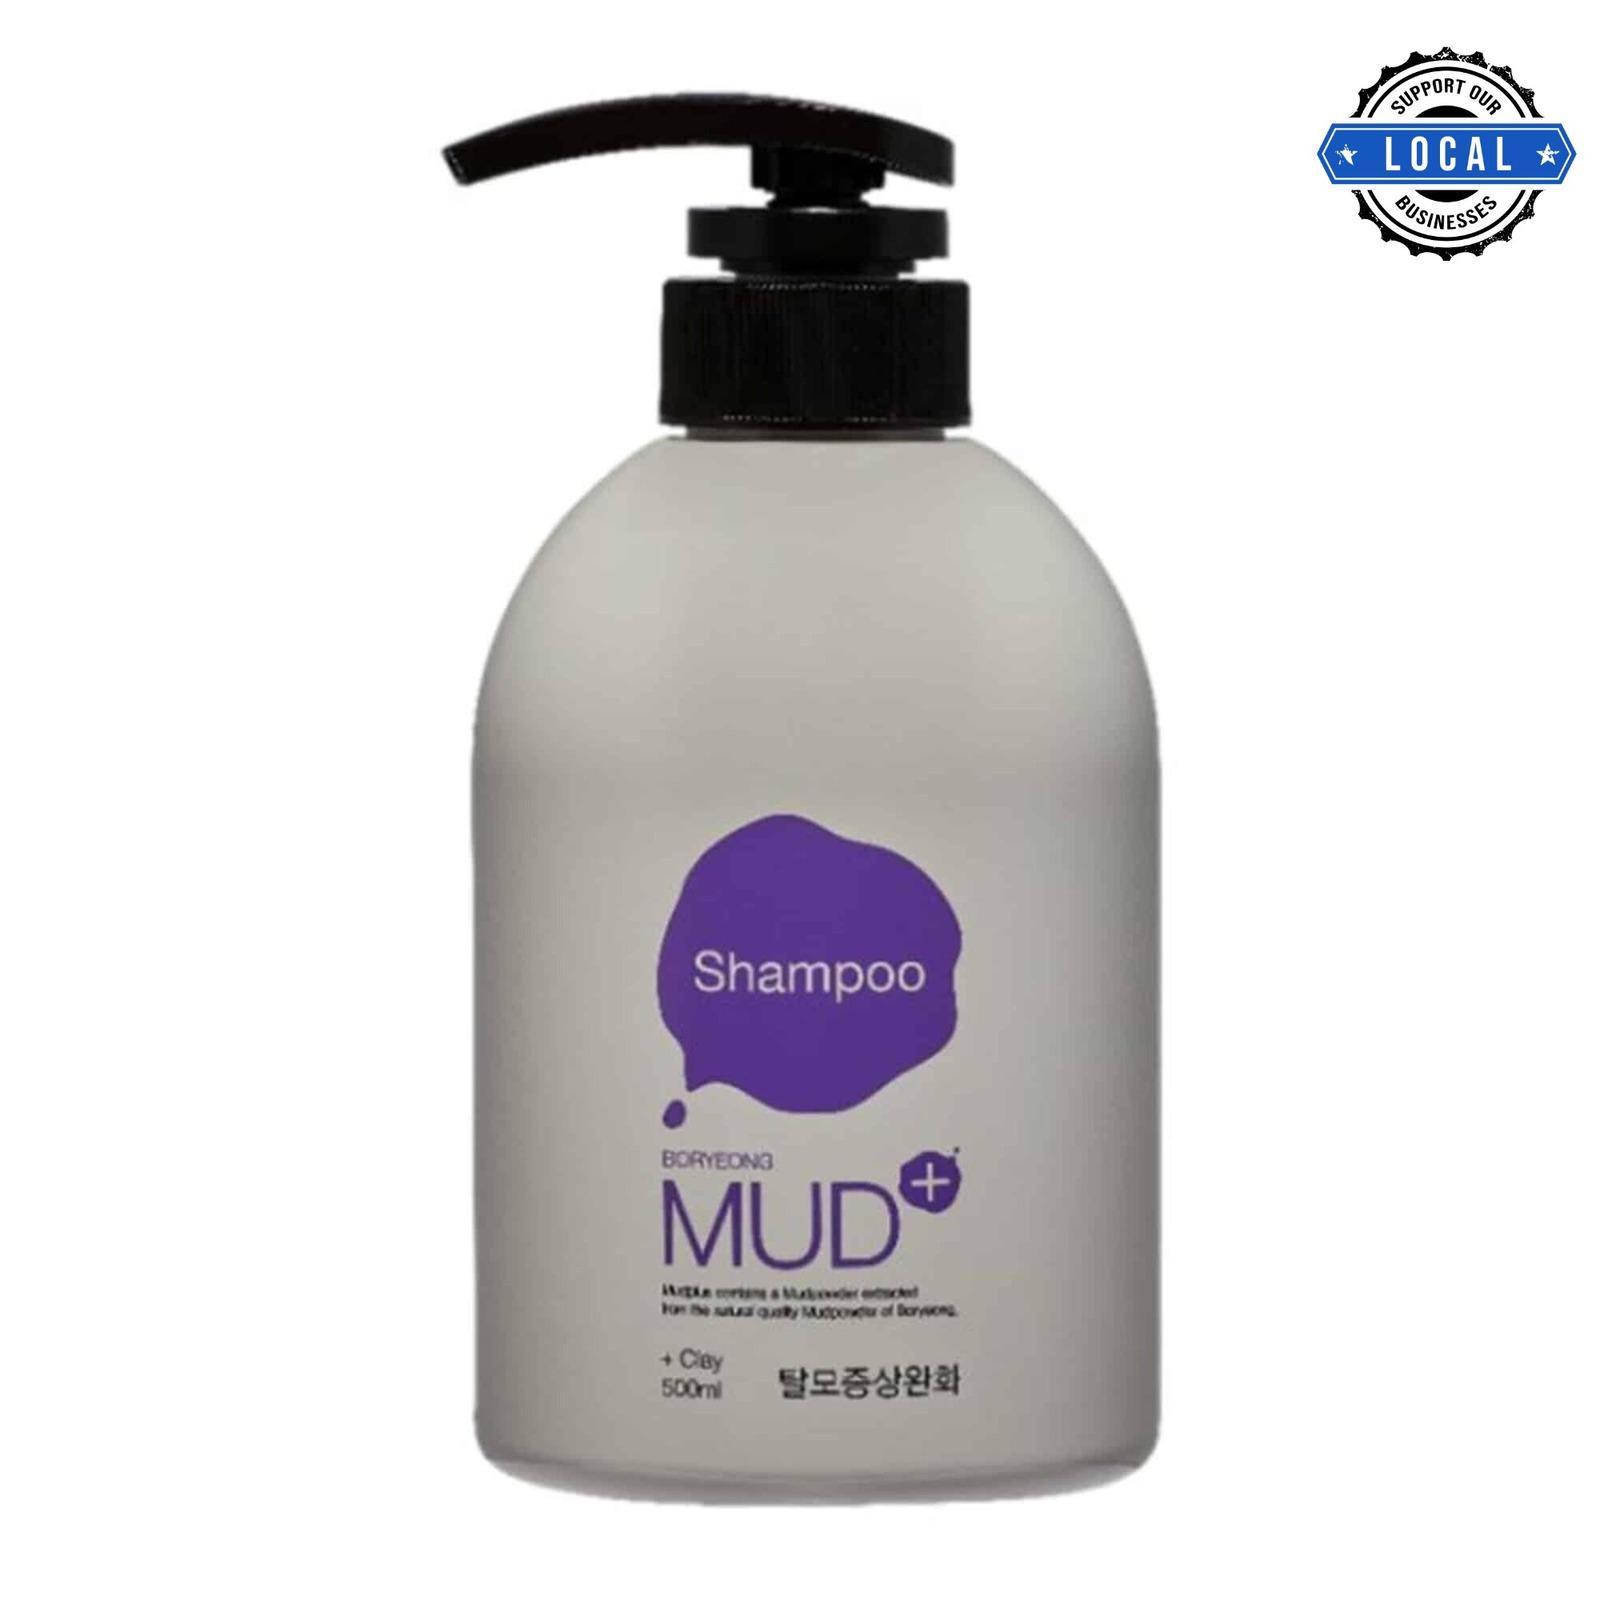 Boryeong Mud Shampoo